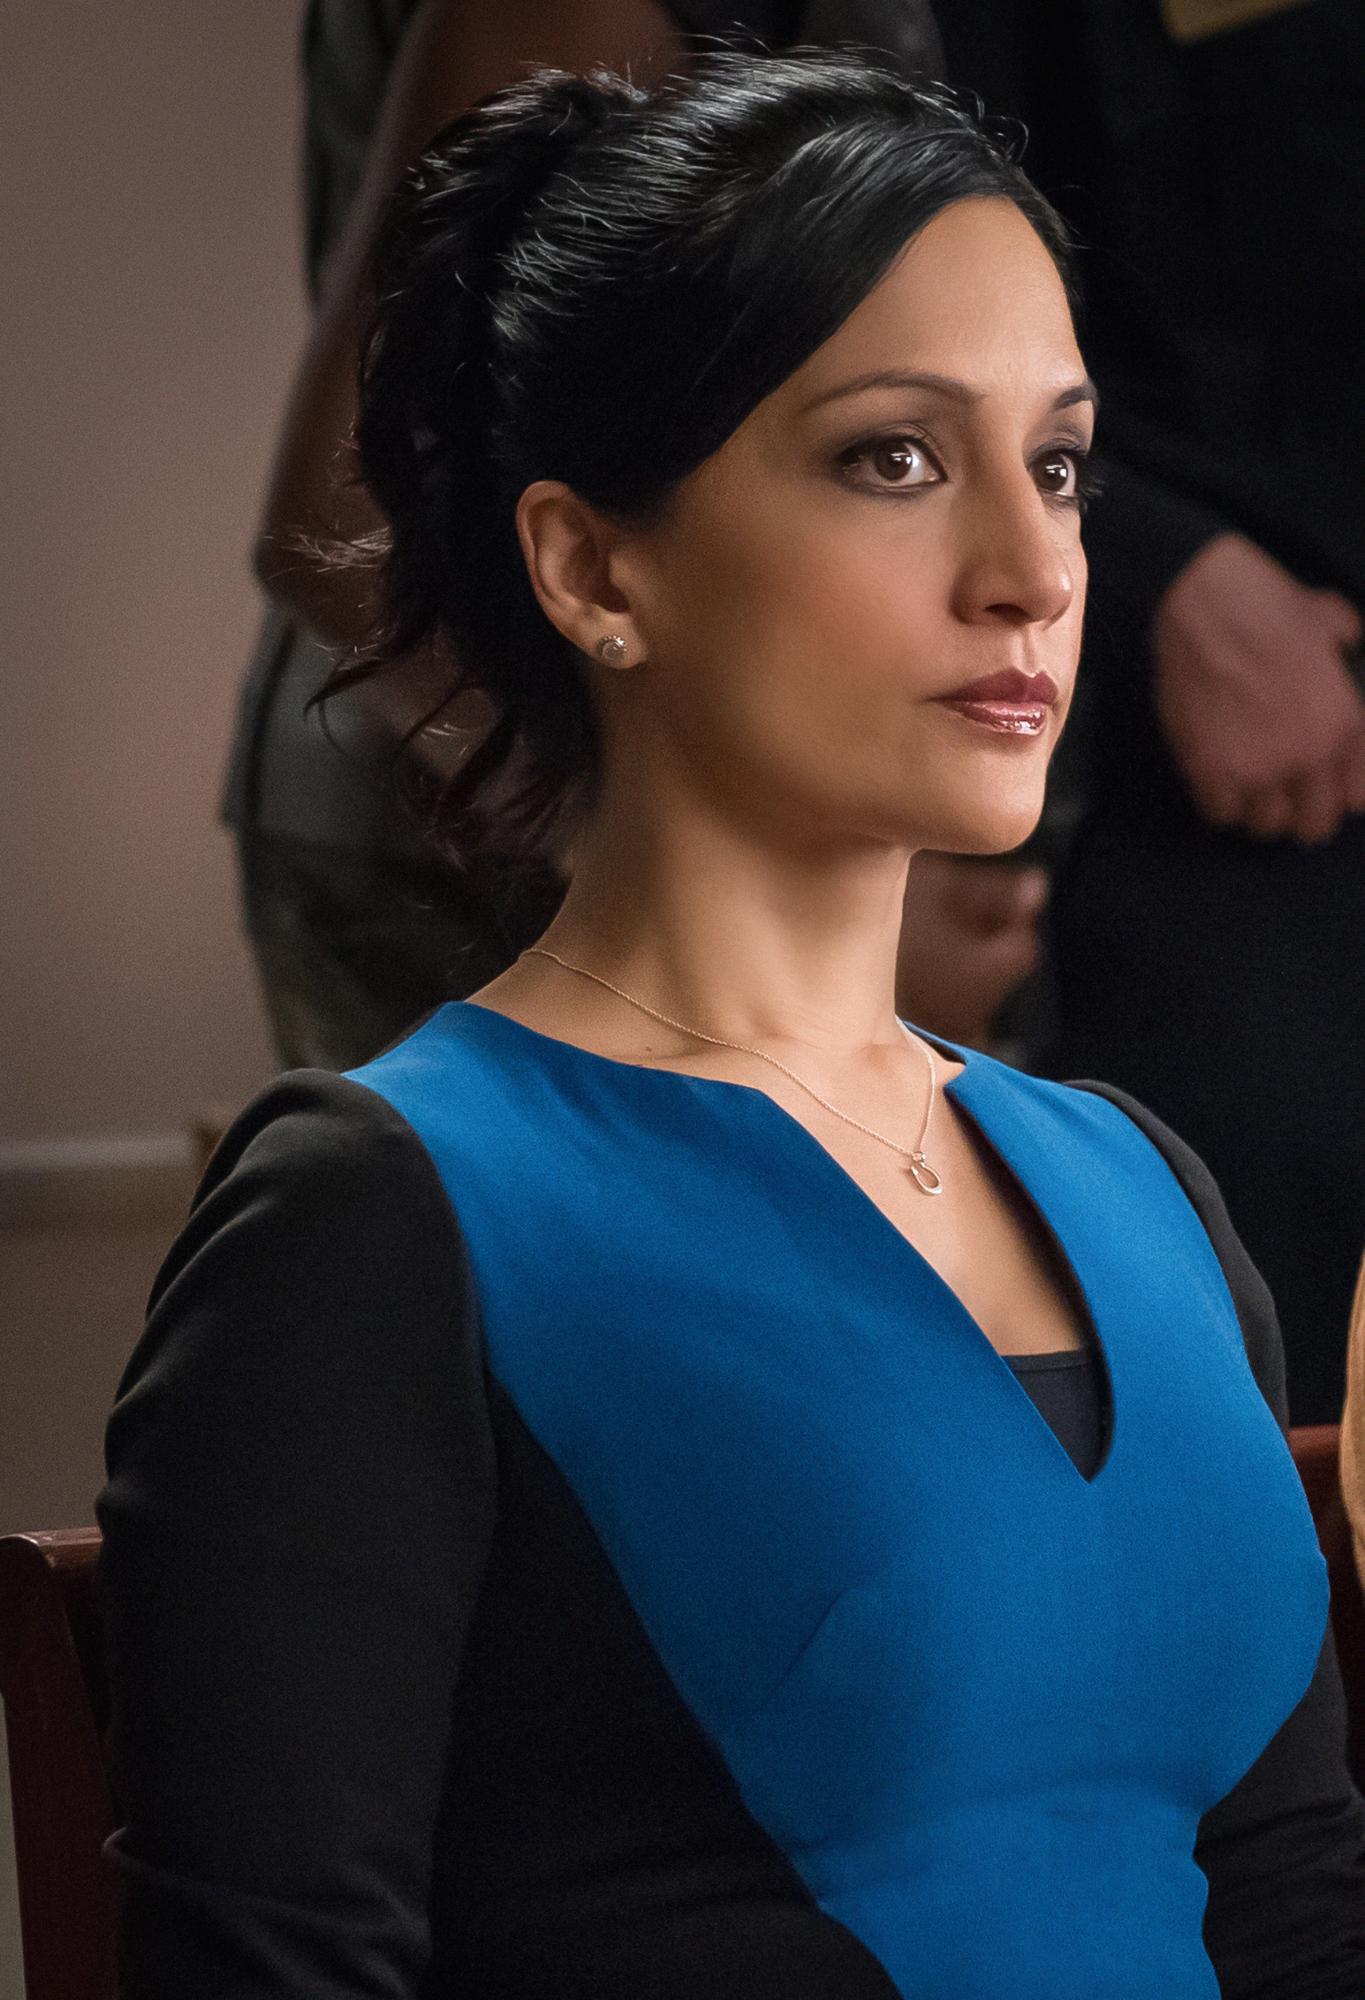 Archie Panjabi as Kalinda Sharma on The Good Wife